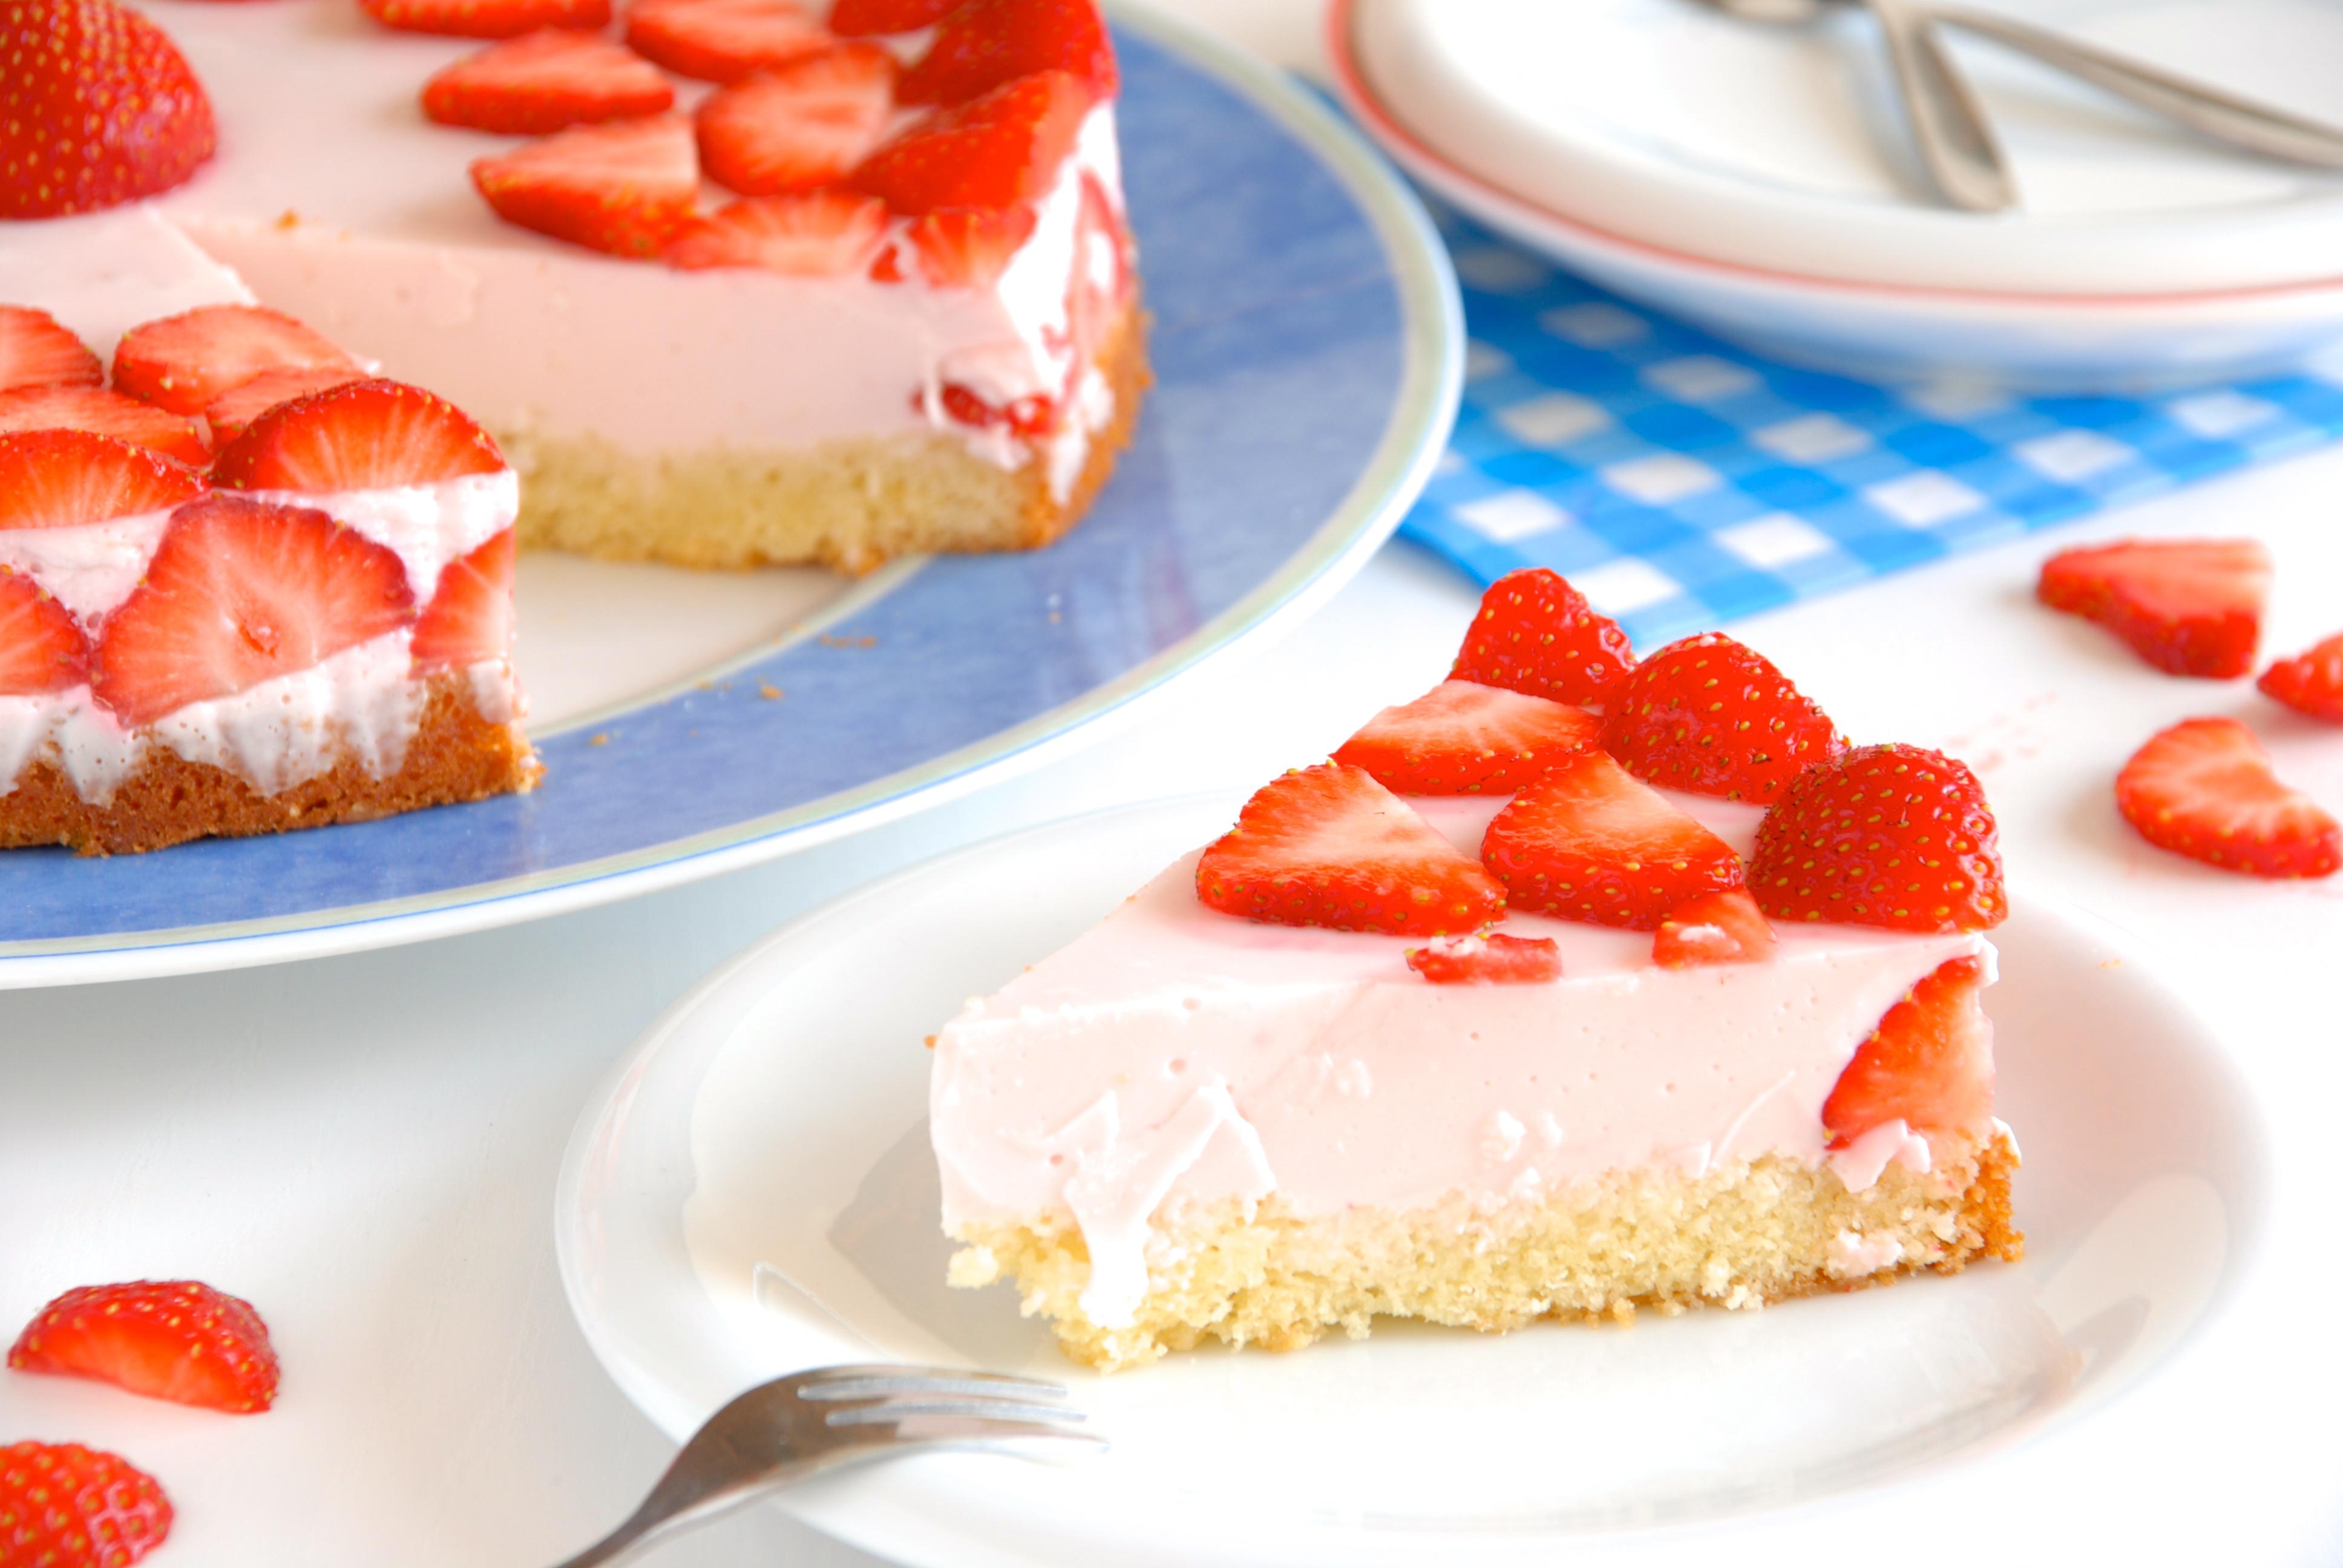 Cake With Fruit Yogurt : Strawberry Yogurt Mousse Cake for My Brother s 23th ...